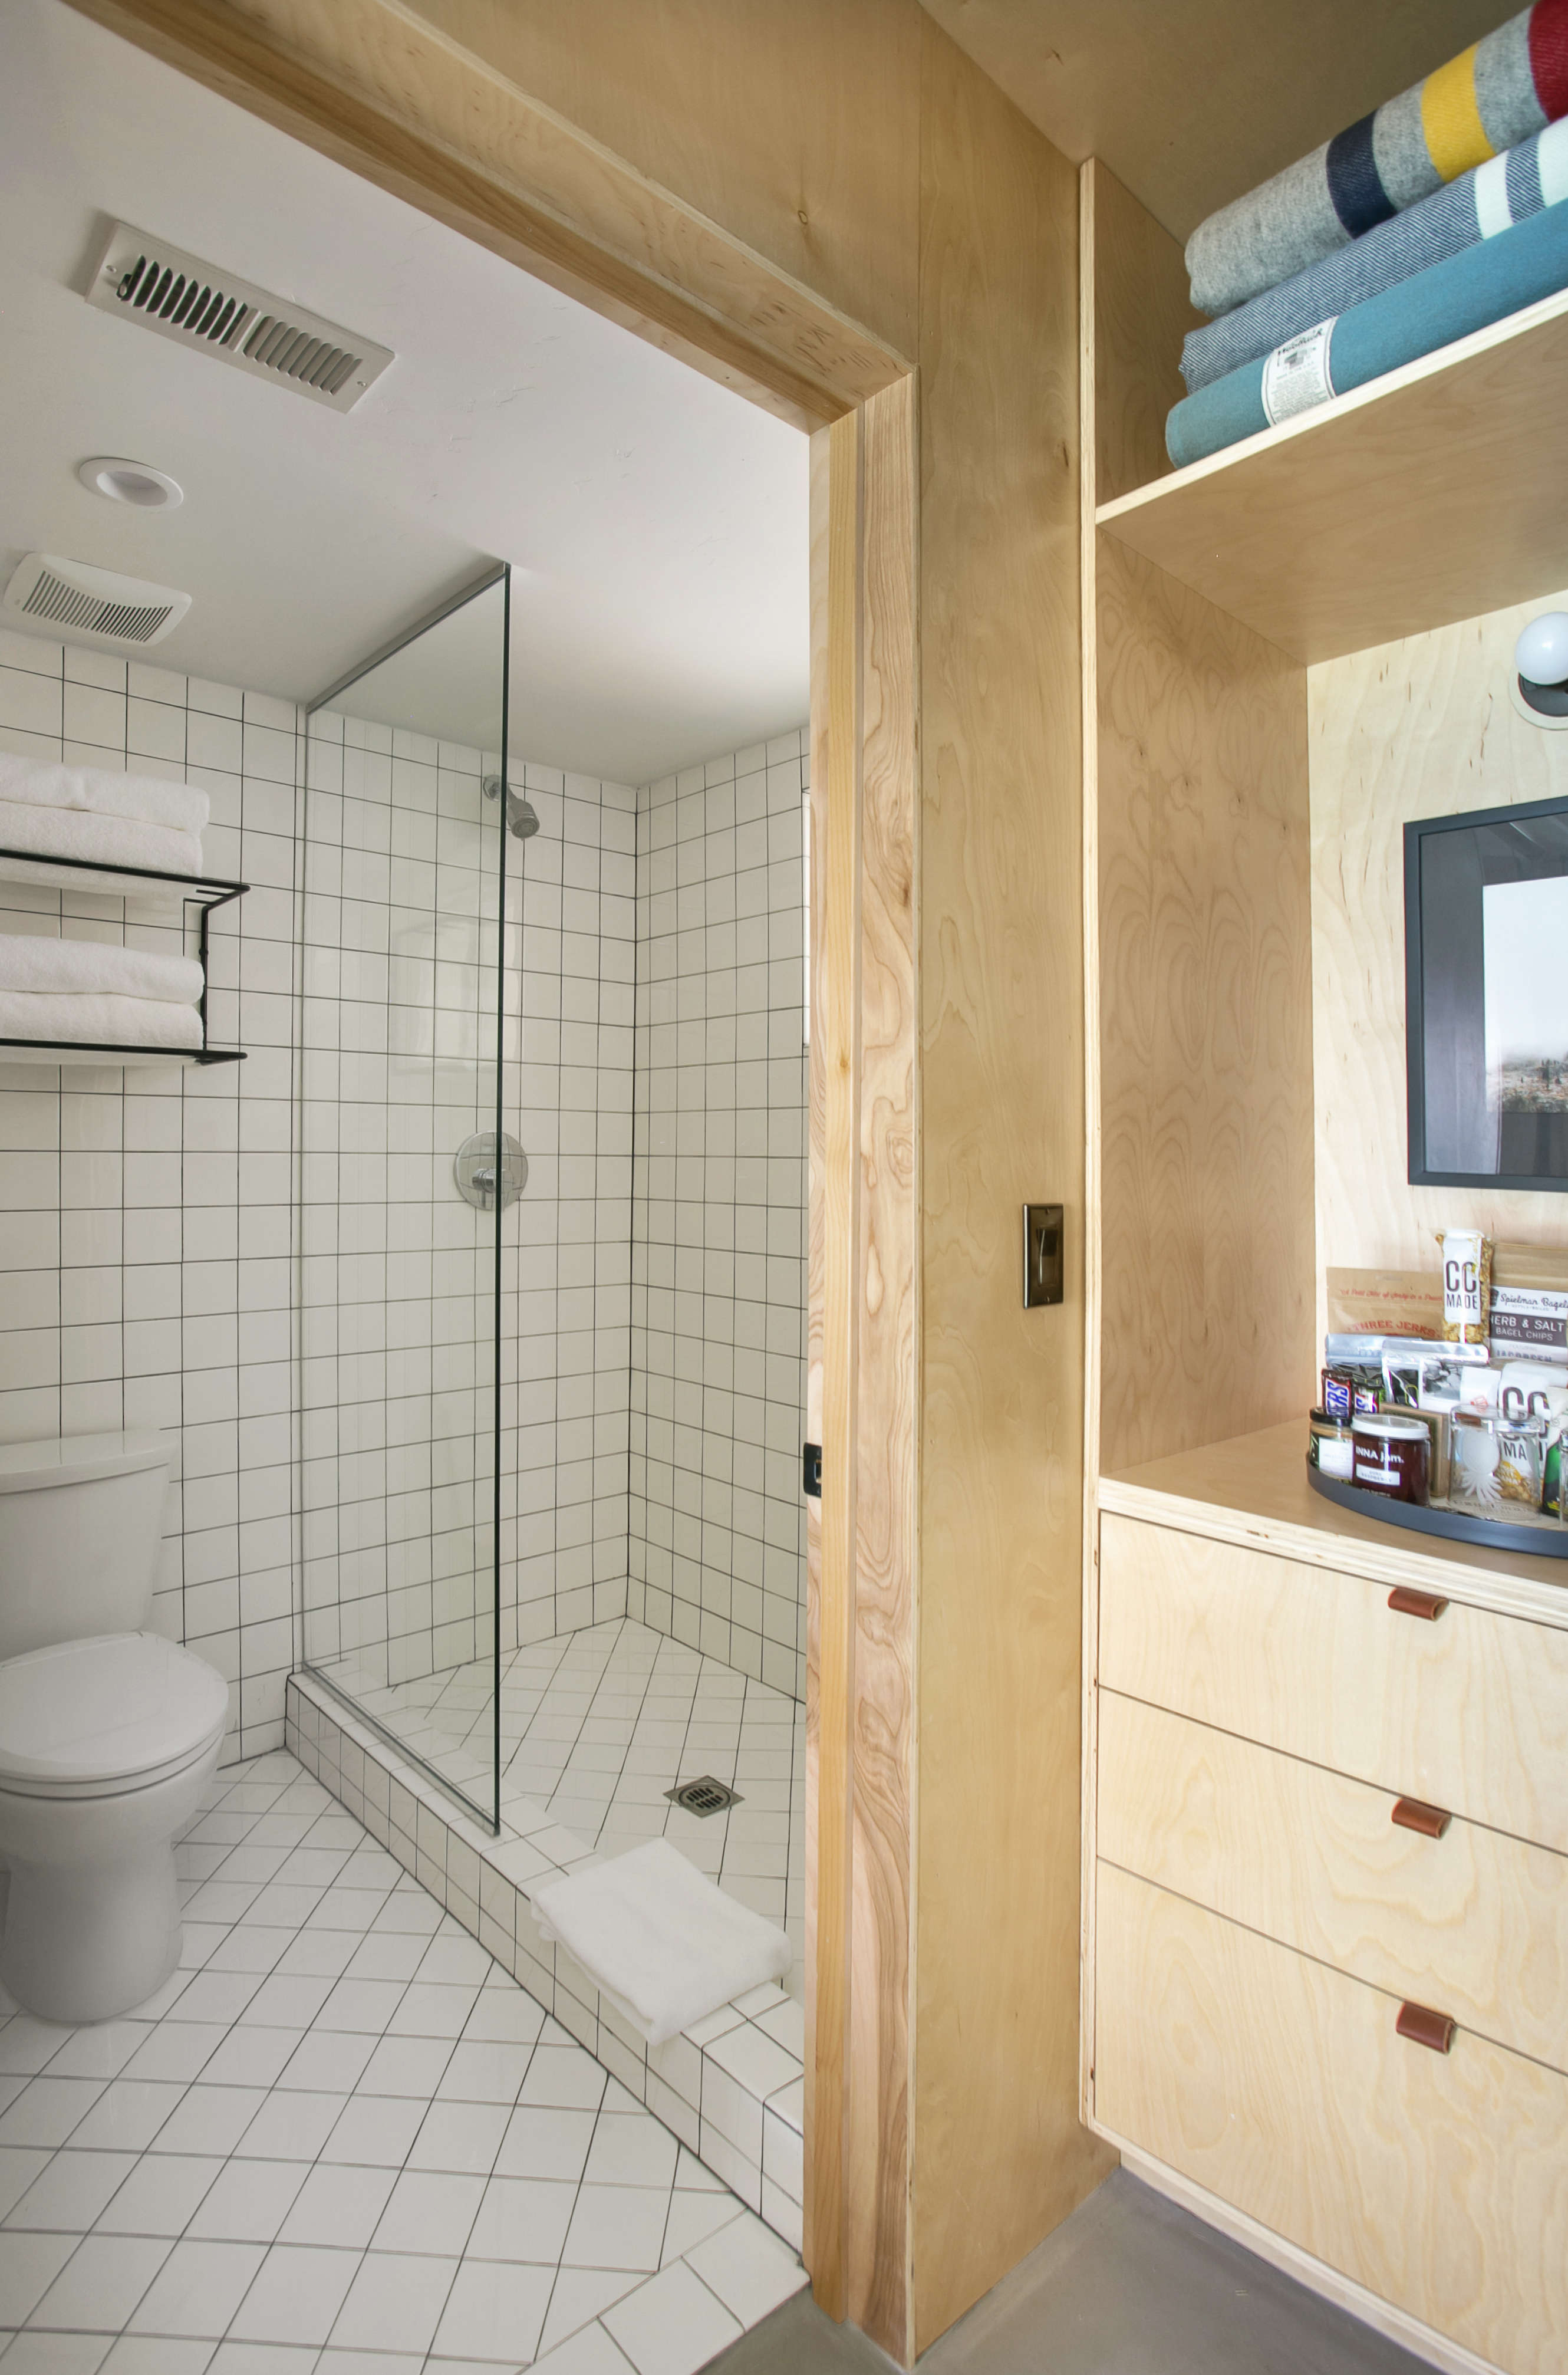 coachman-hotel-white-tile-bathroom-with-plywood-entryway